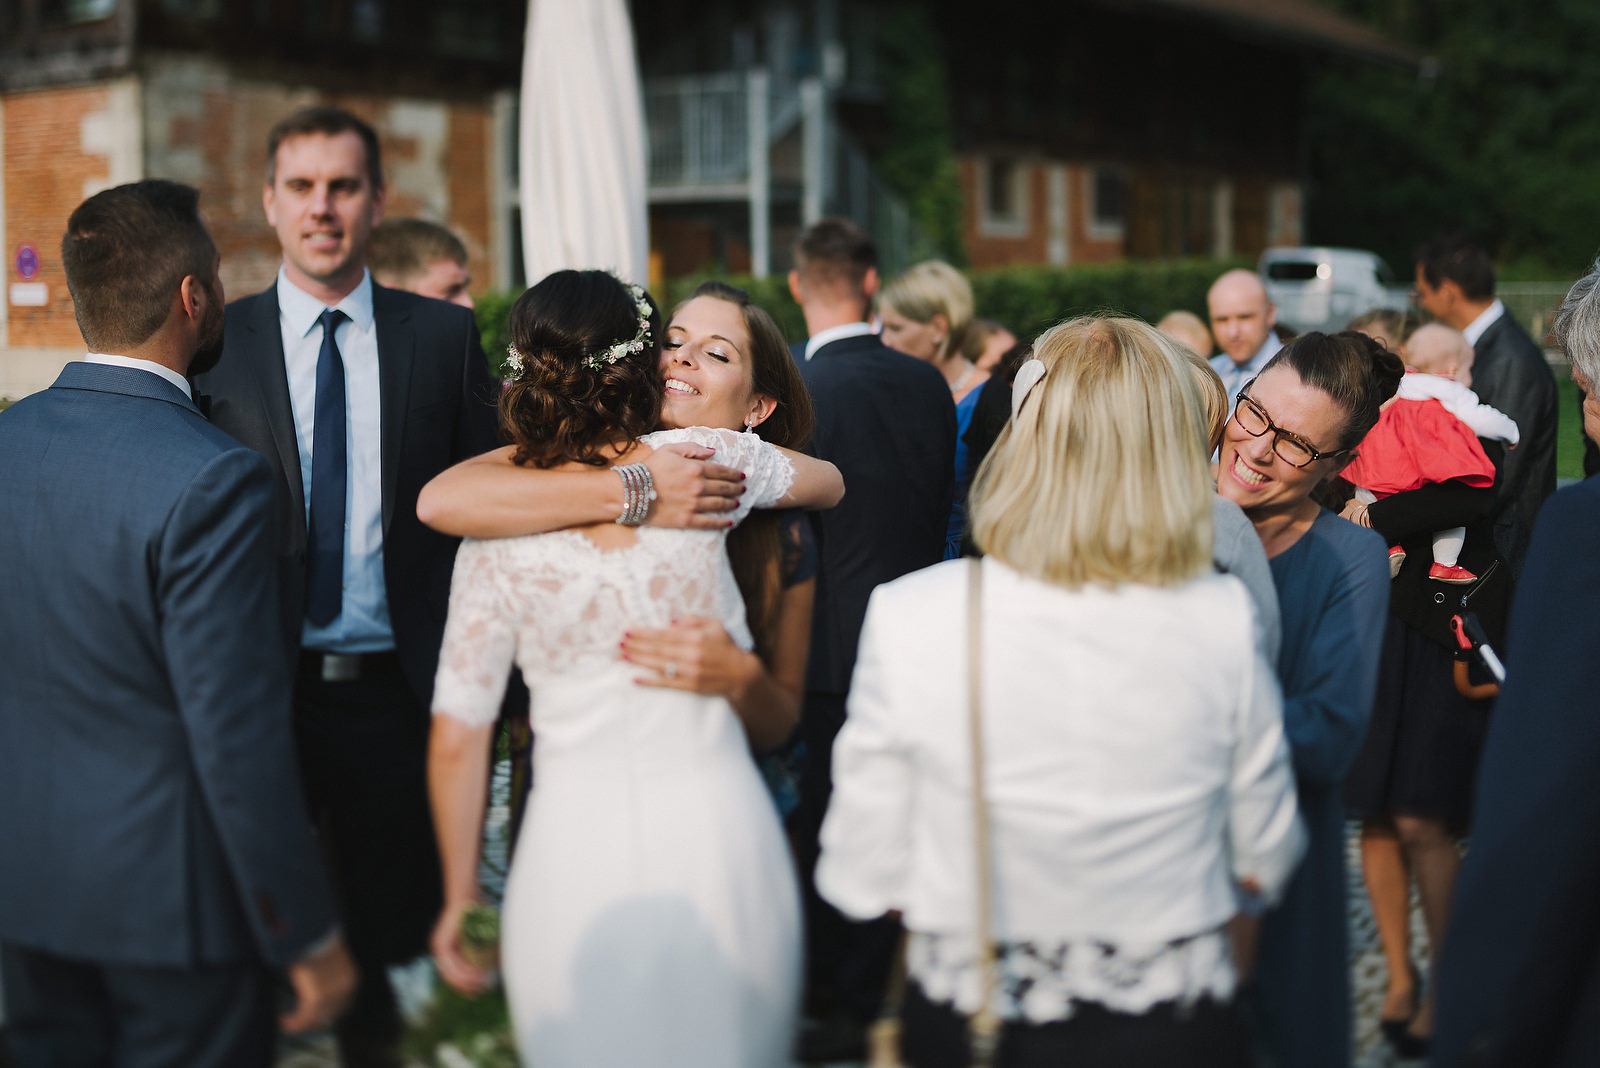 Fotograf Konstanz - Hochzeitsfotograf Reutlingen Achalm Hochzeit EFP 68 - Als Hochzeitsfotograf auf der Achalm, Reutlingen  - 53 -